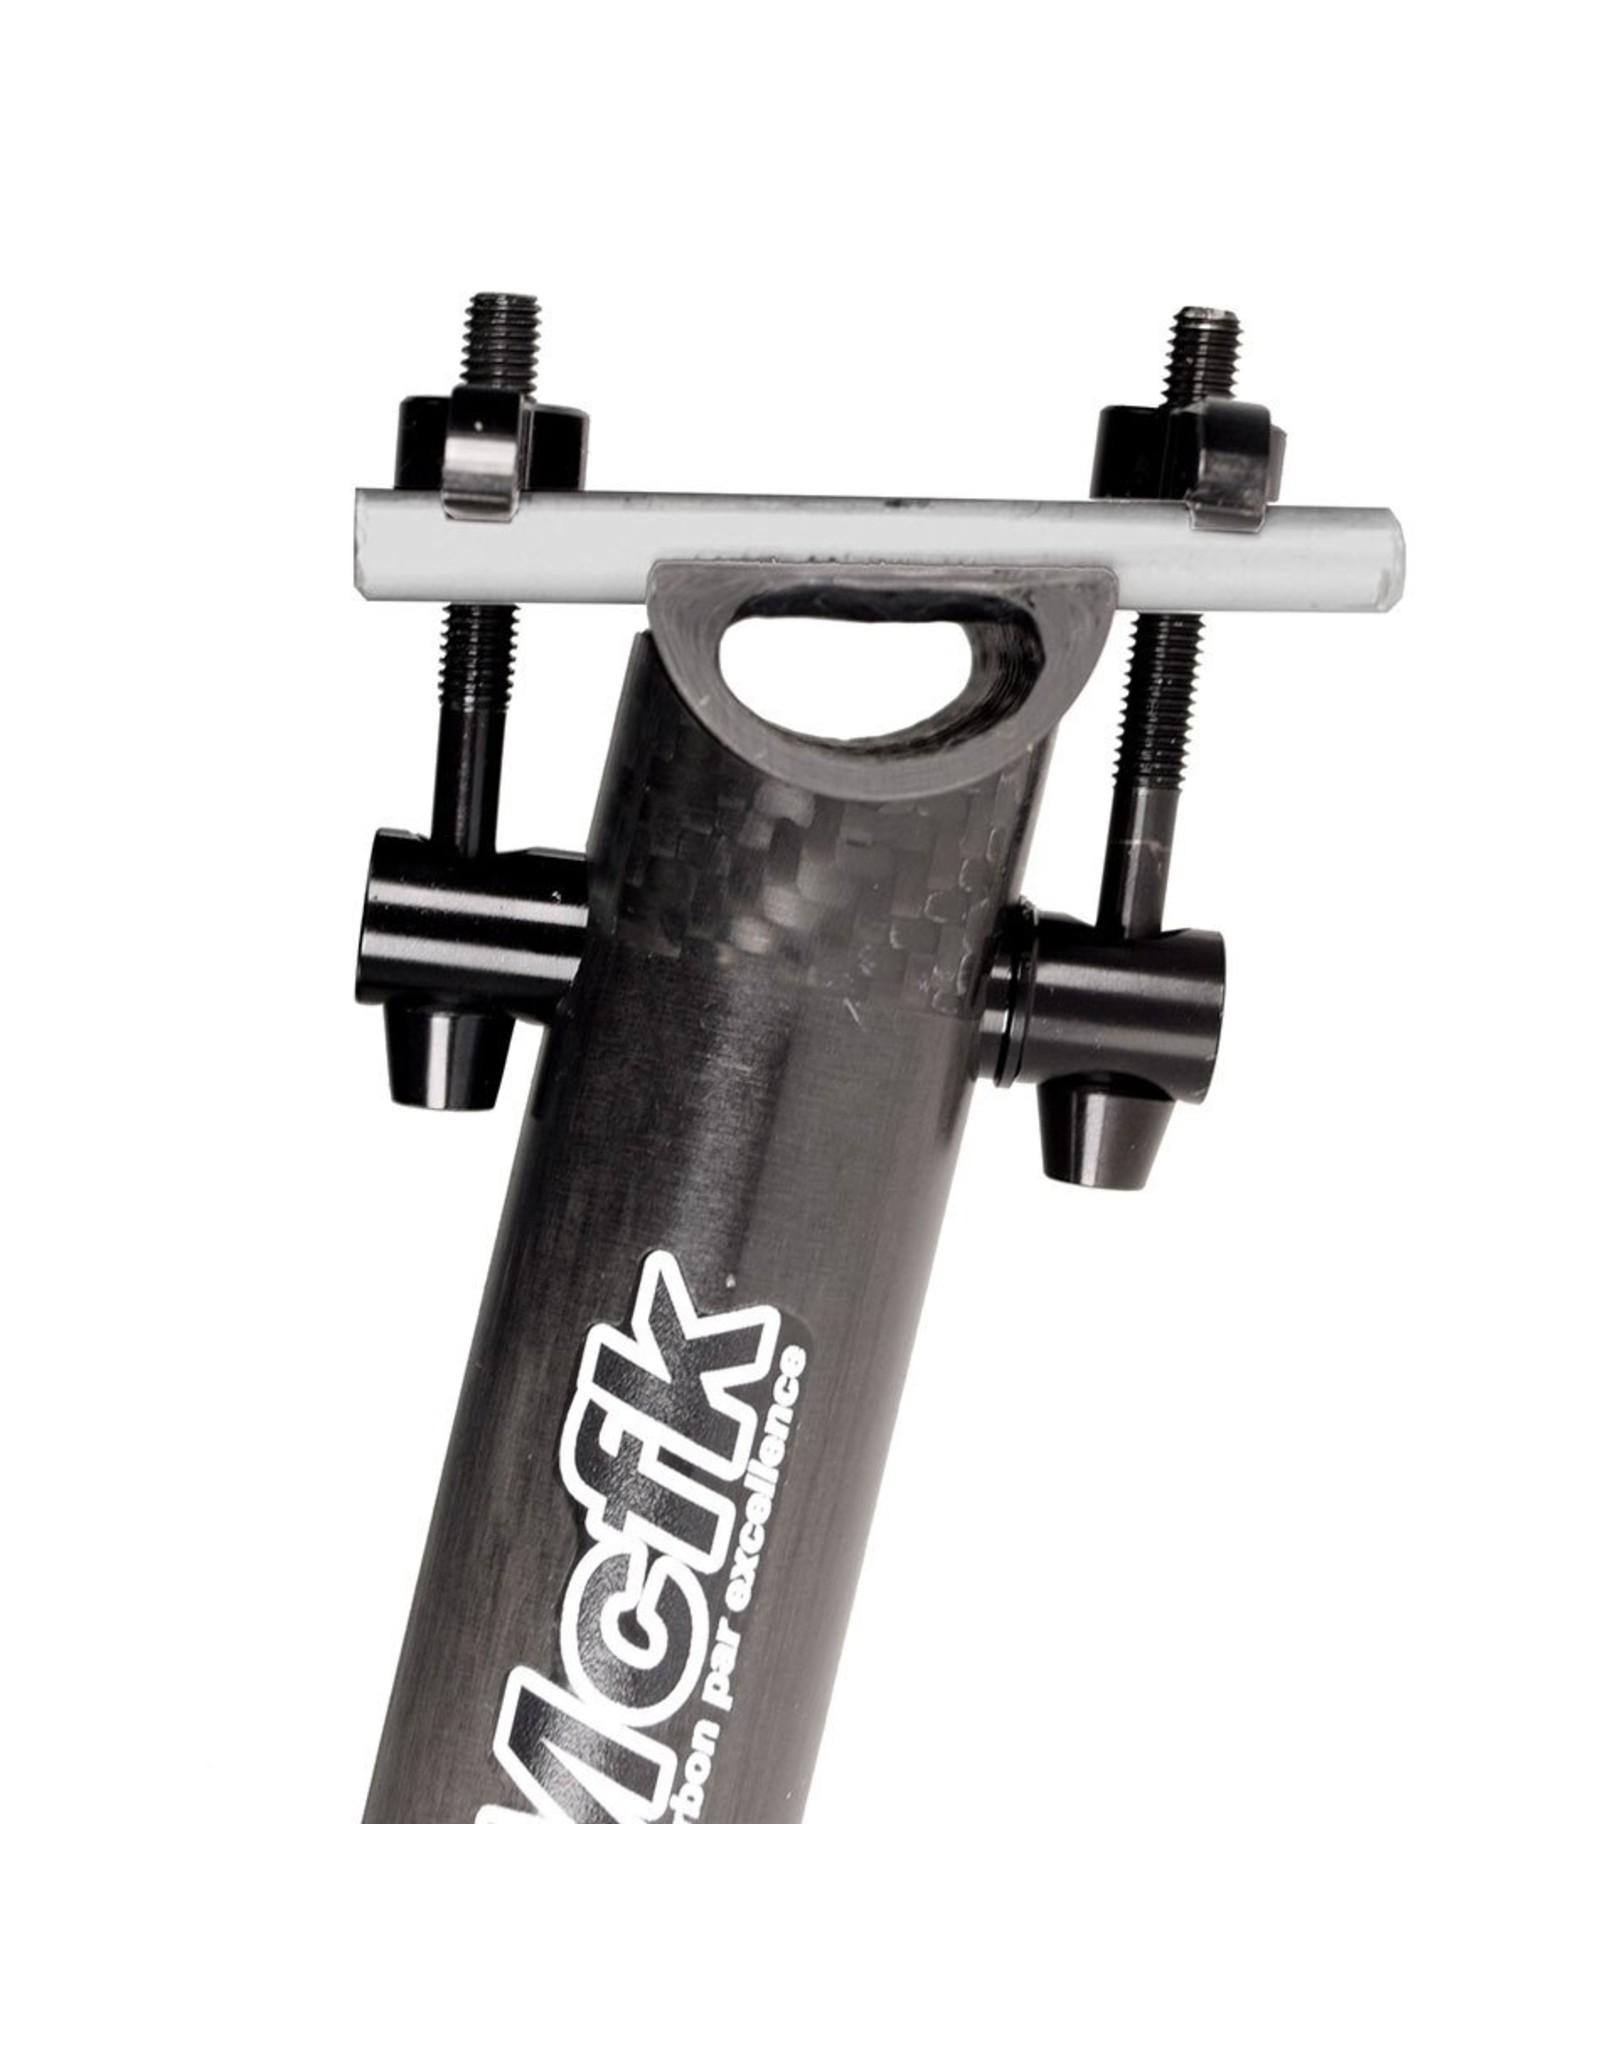 Mcfk Mcfk Carbon Straight Seatpost